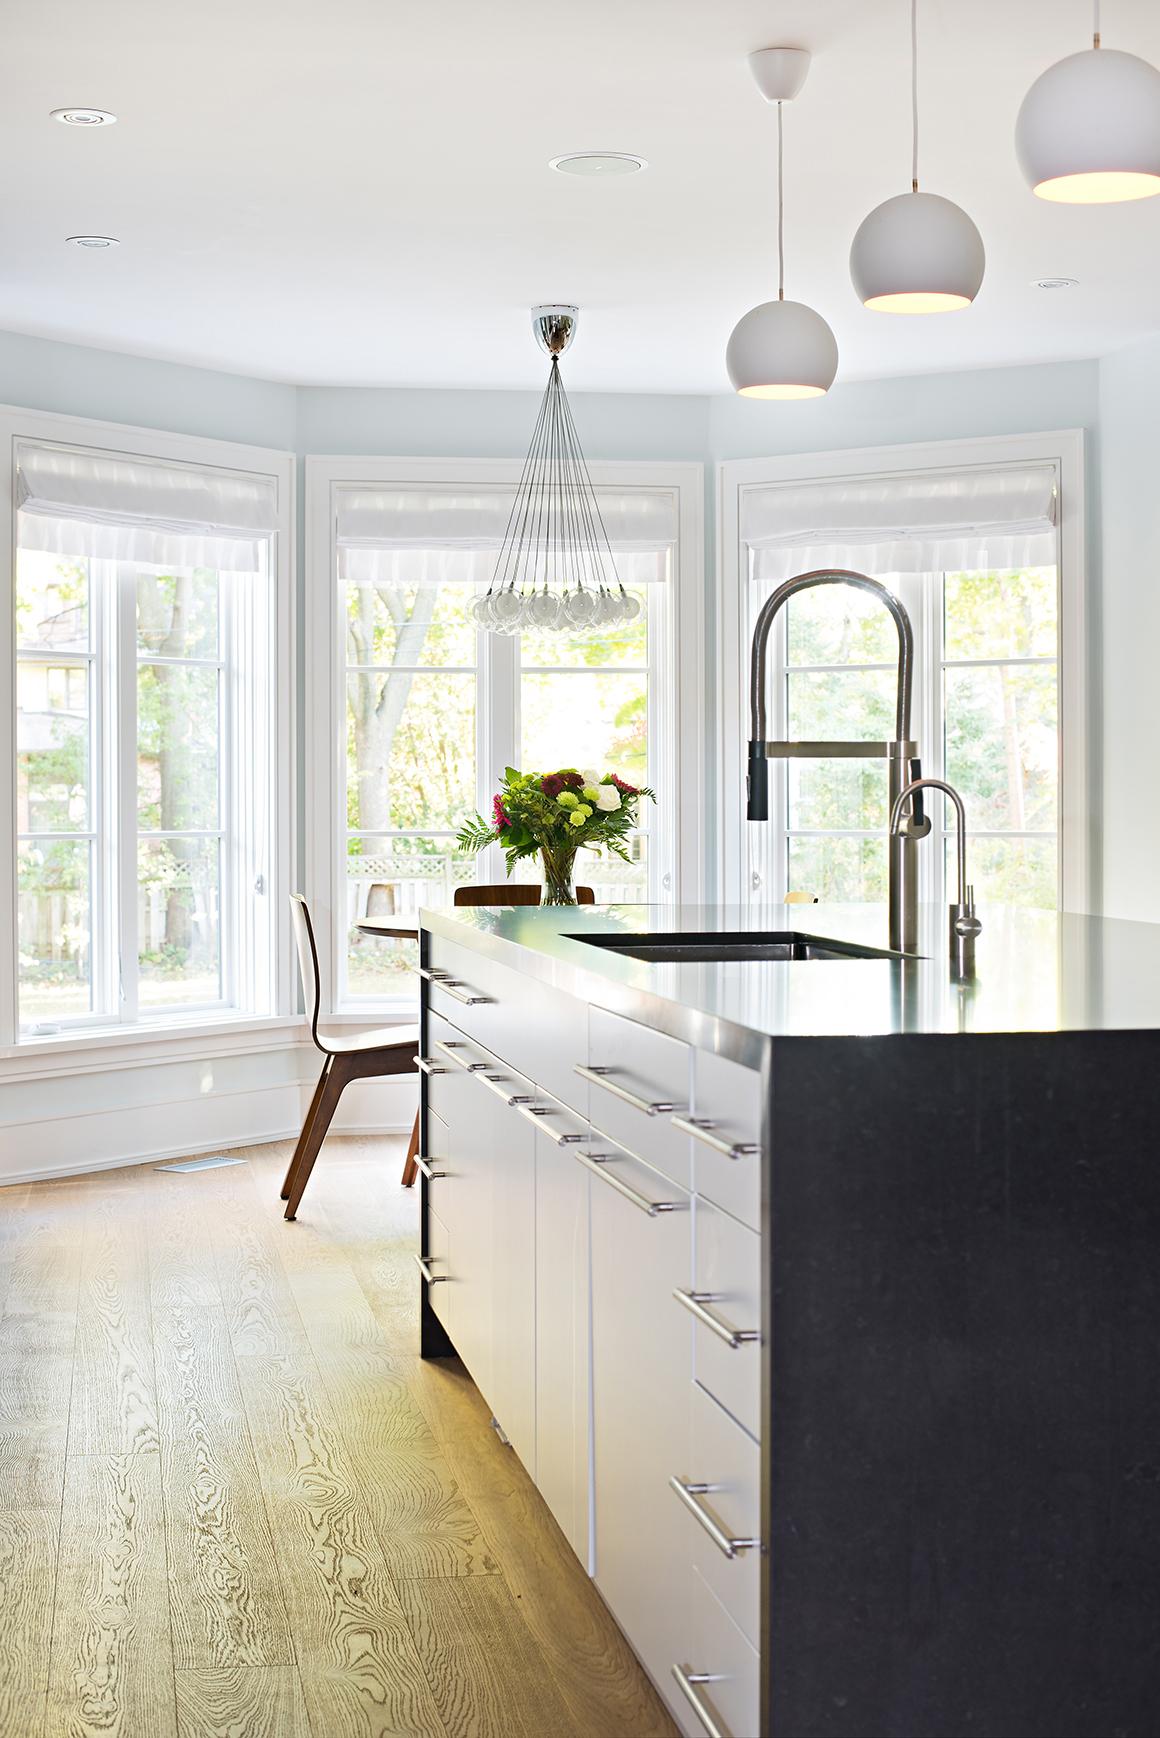 White oak wide plank flooring; modern statement pendants over island and breakfast nook by Four Blocks South interior design